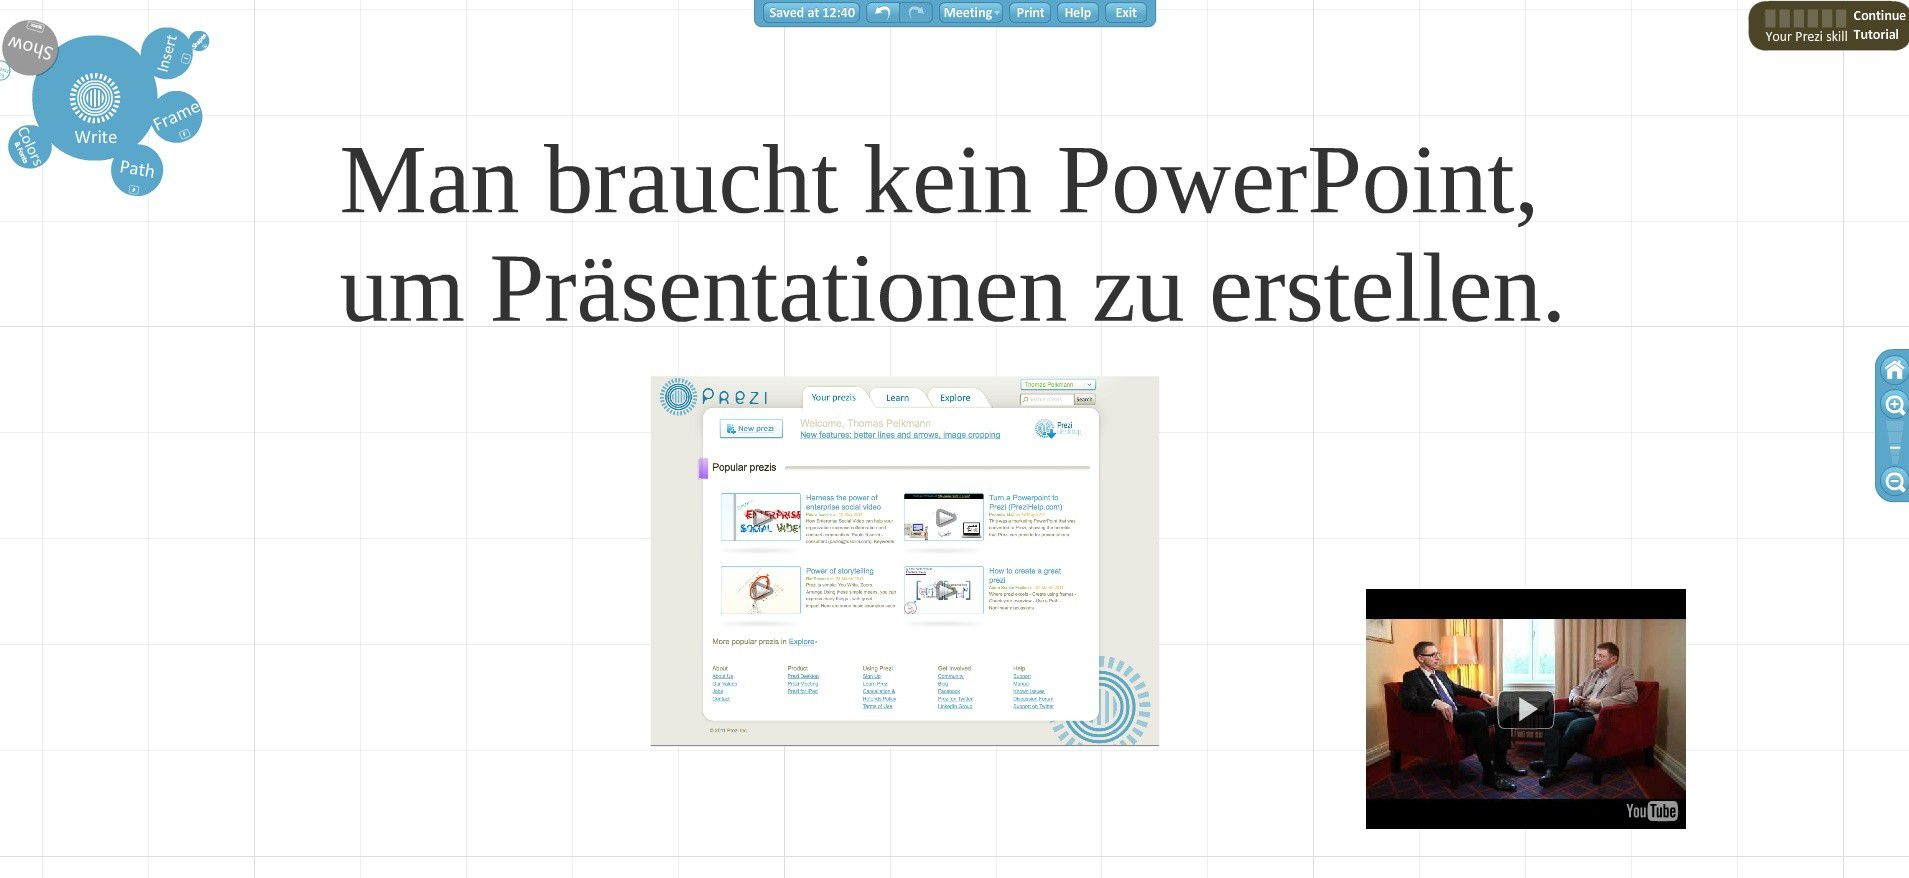 Powerpoint - Gratis-Alternativen aus der Cloud - PC-WELT